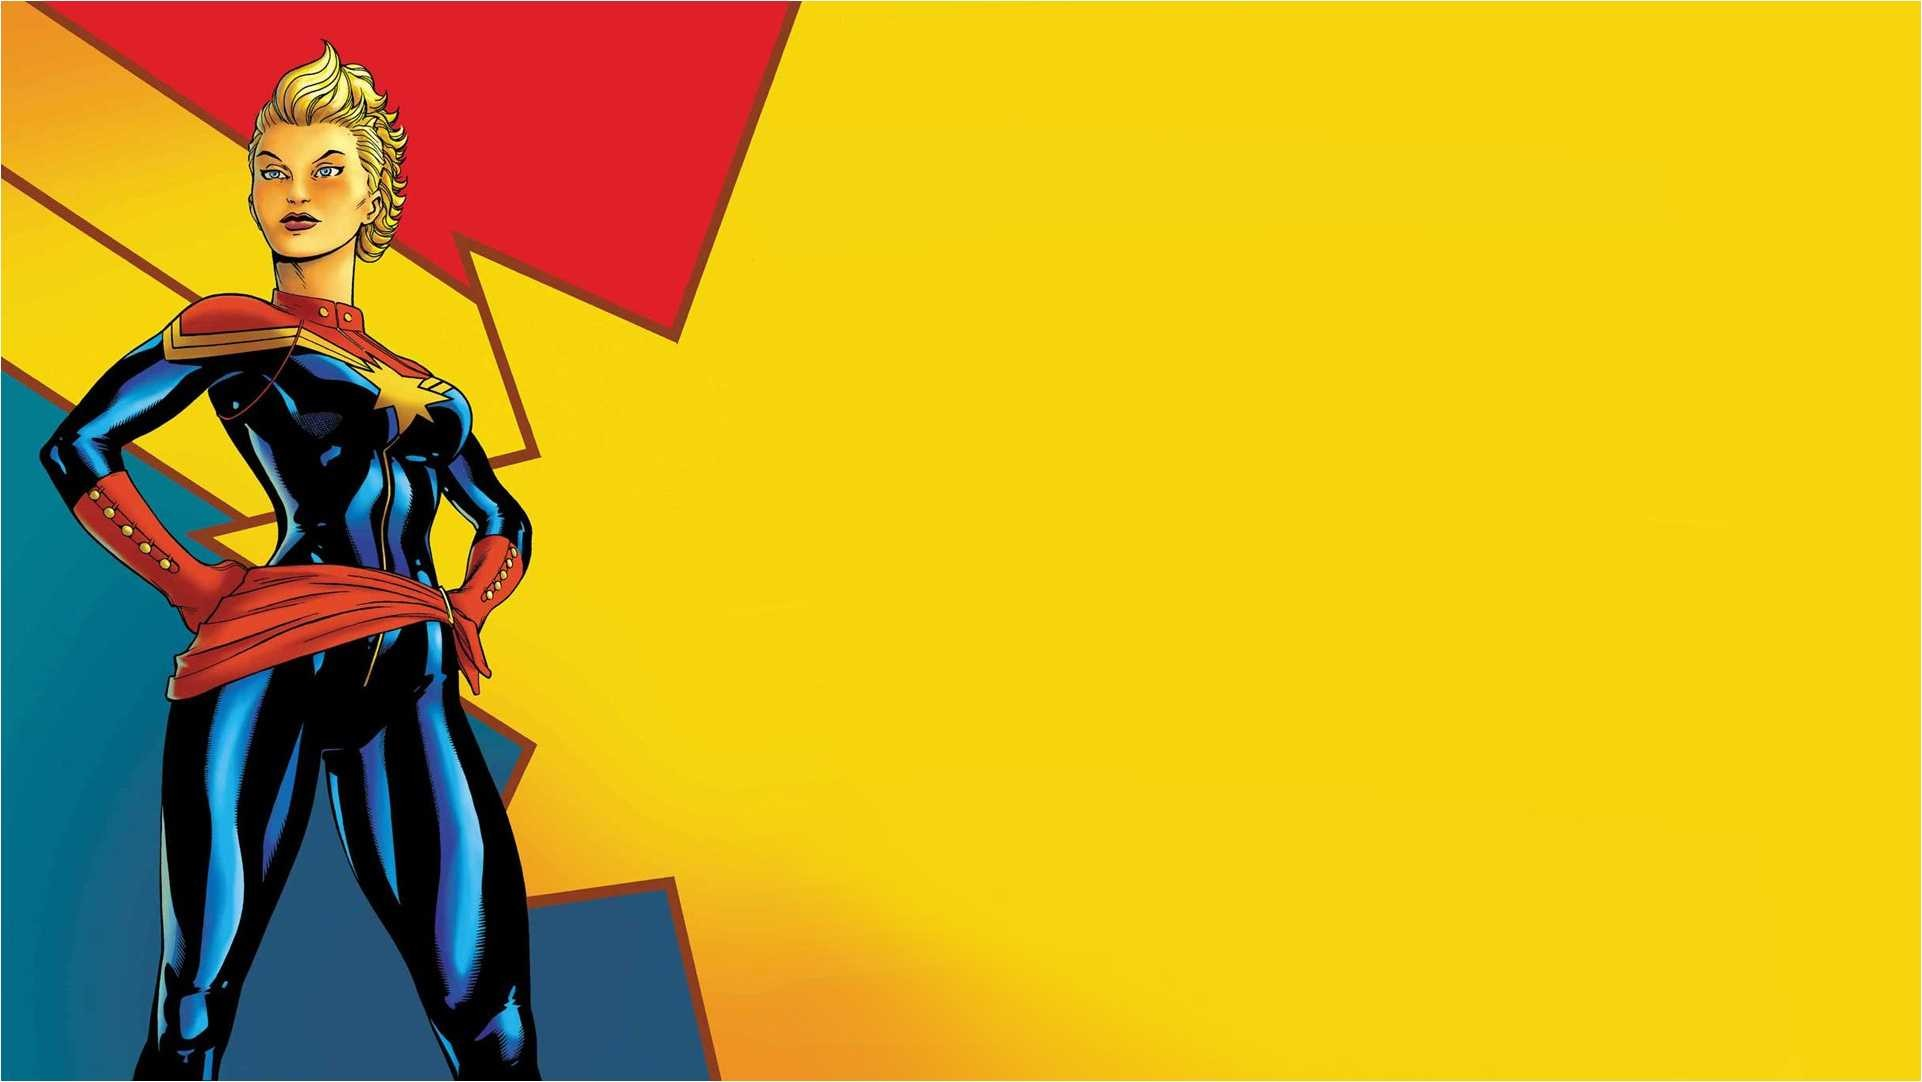 Res: 1922x1082, (1920x1080) - Captain Marvel Wallpapers, Winston Swatzell